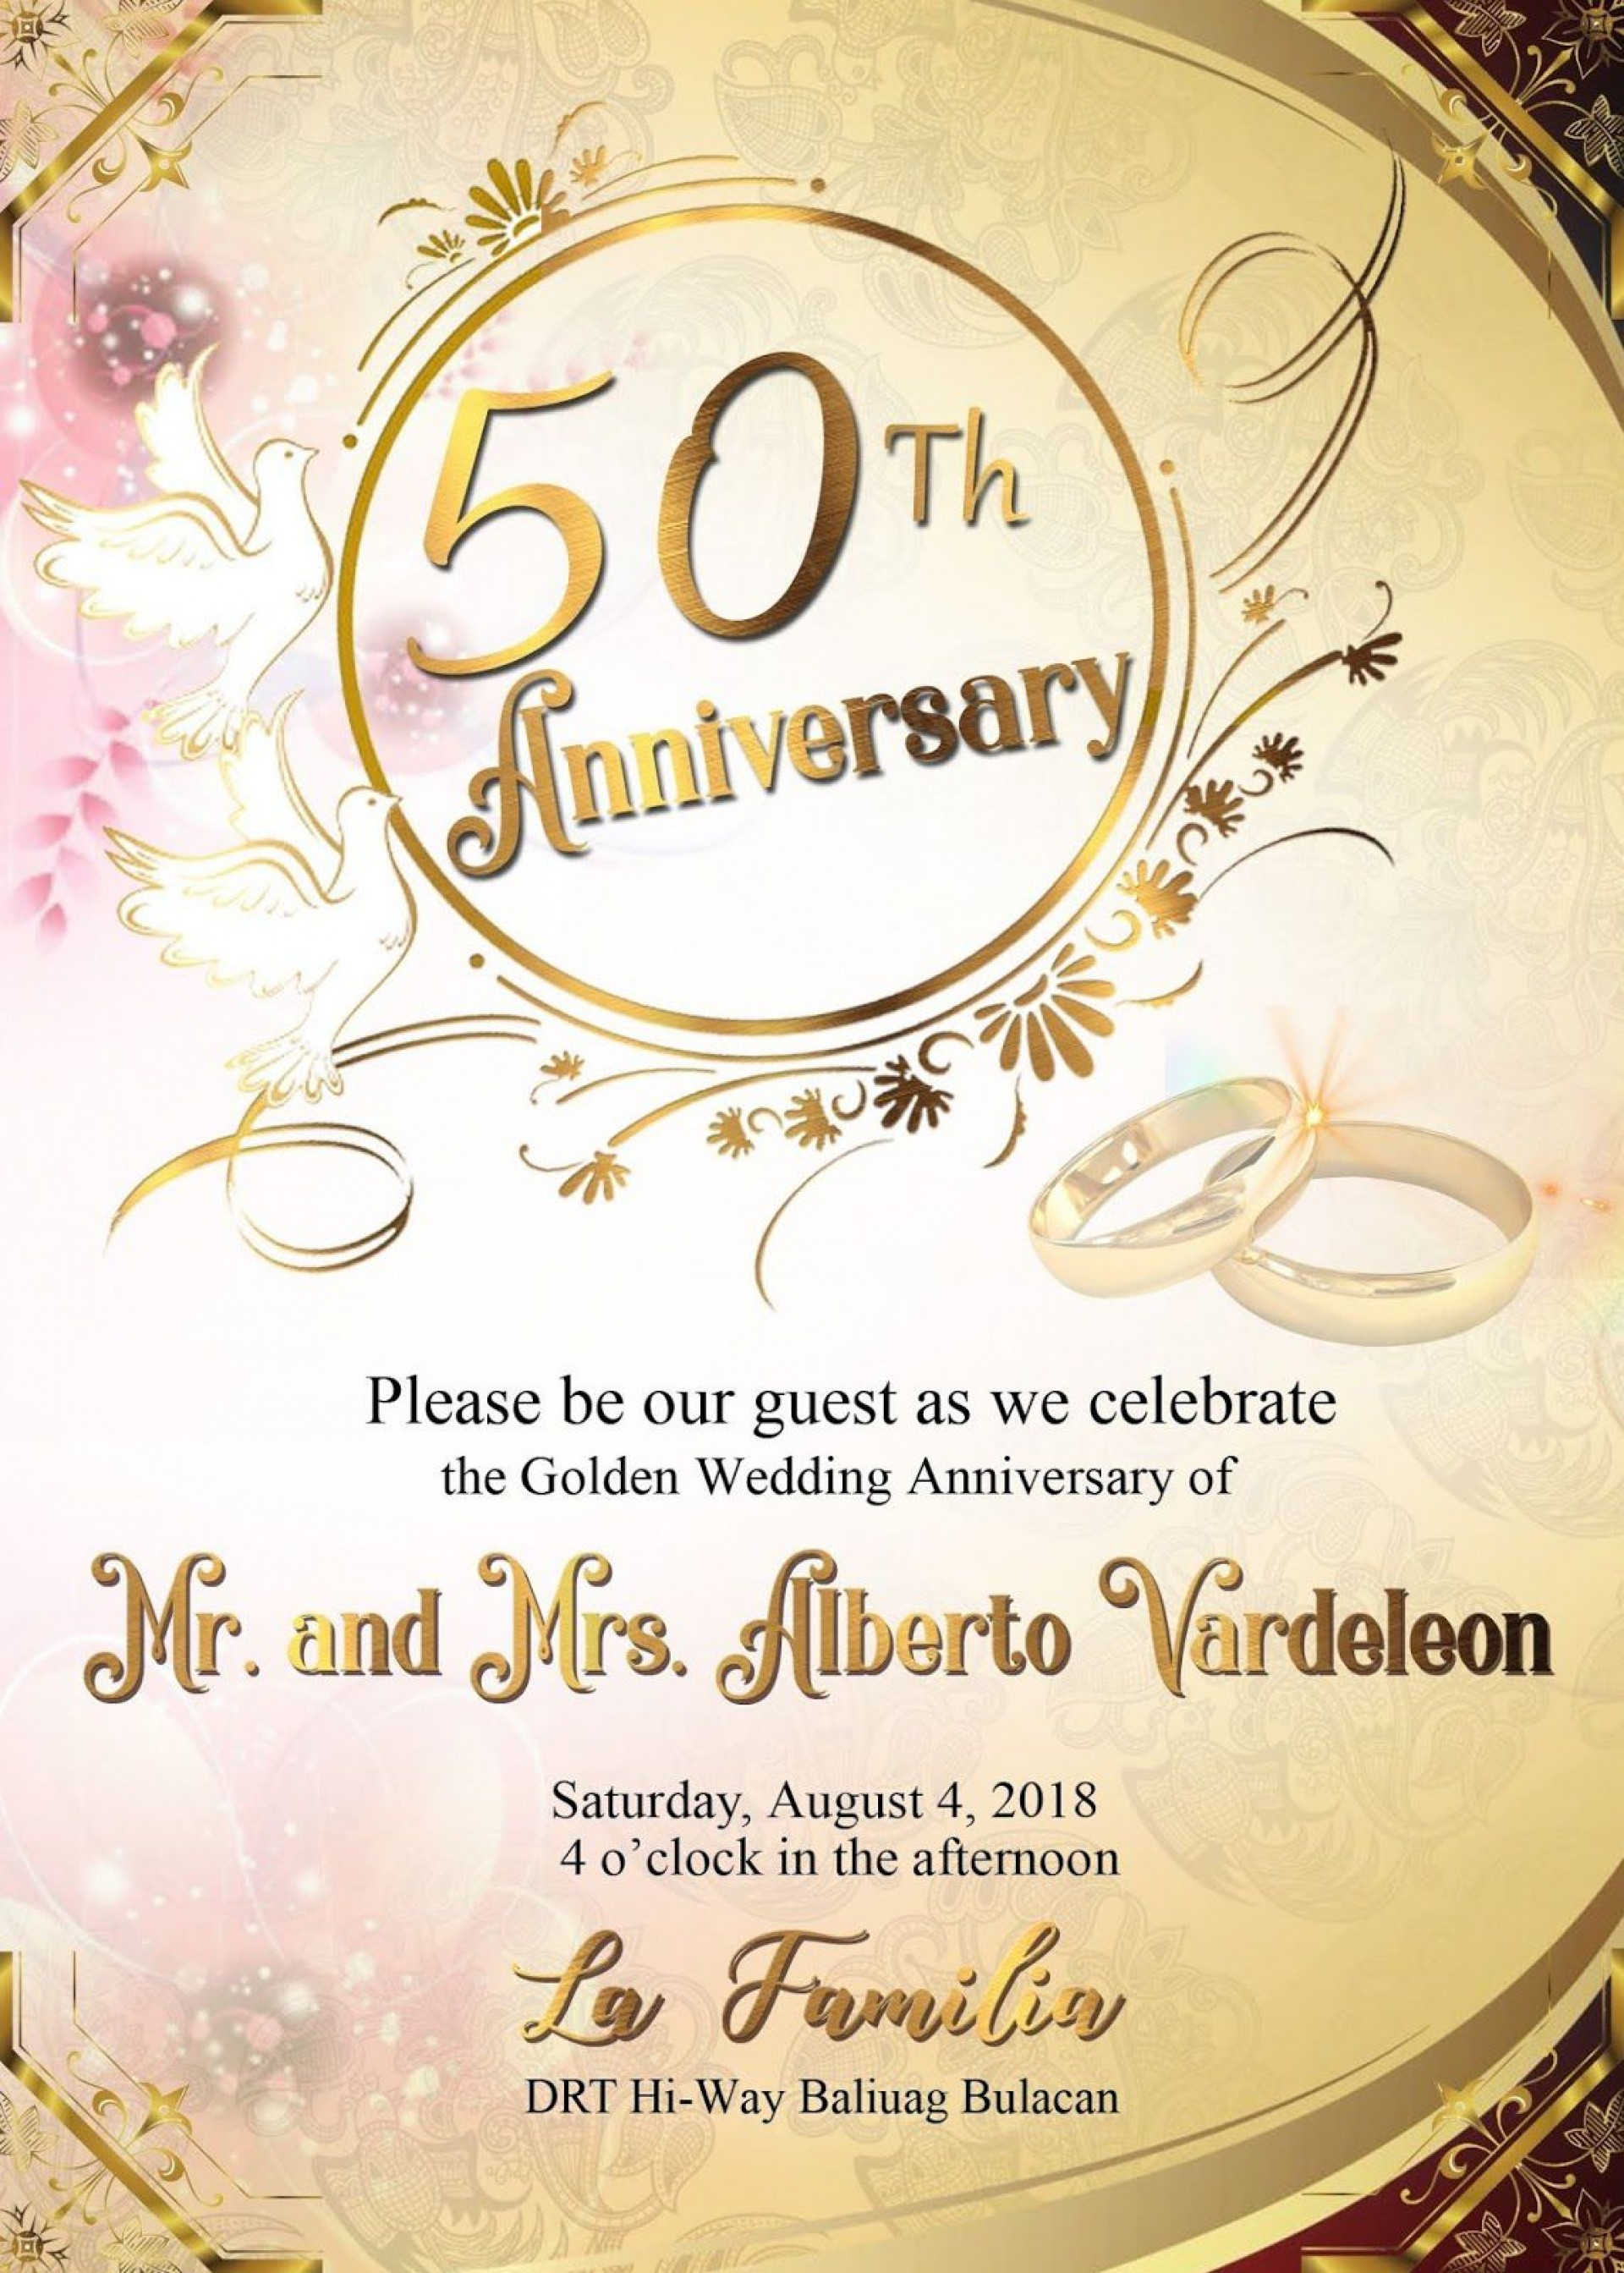 009 Frightening 50th Wedding Anniversary Invitation Card Sample High Resolution  Wording1920